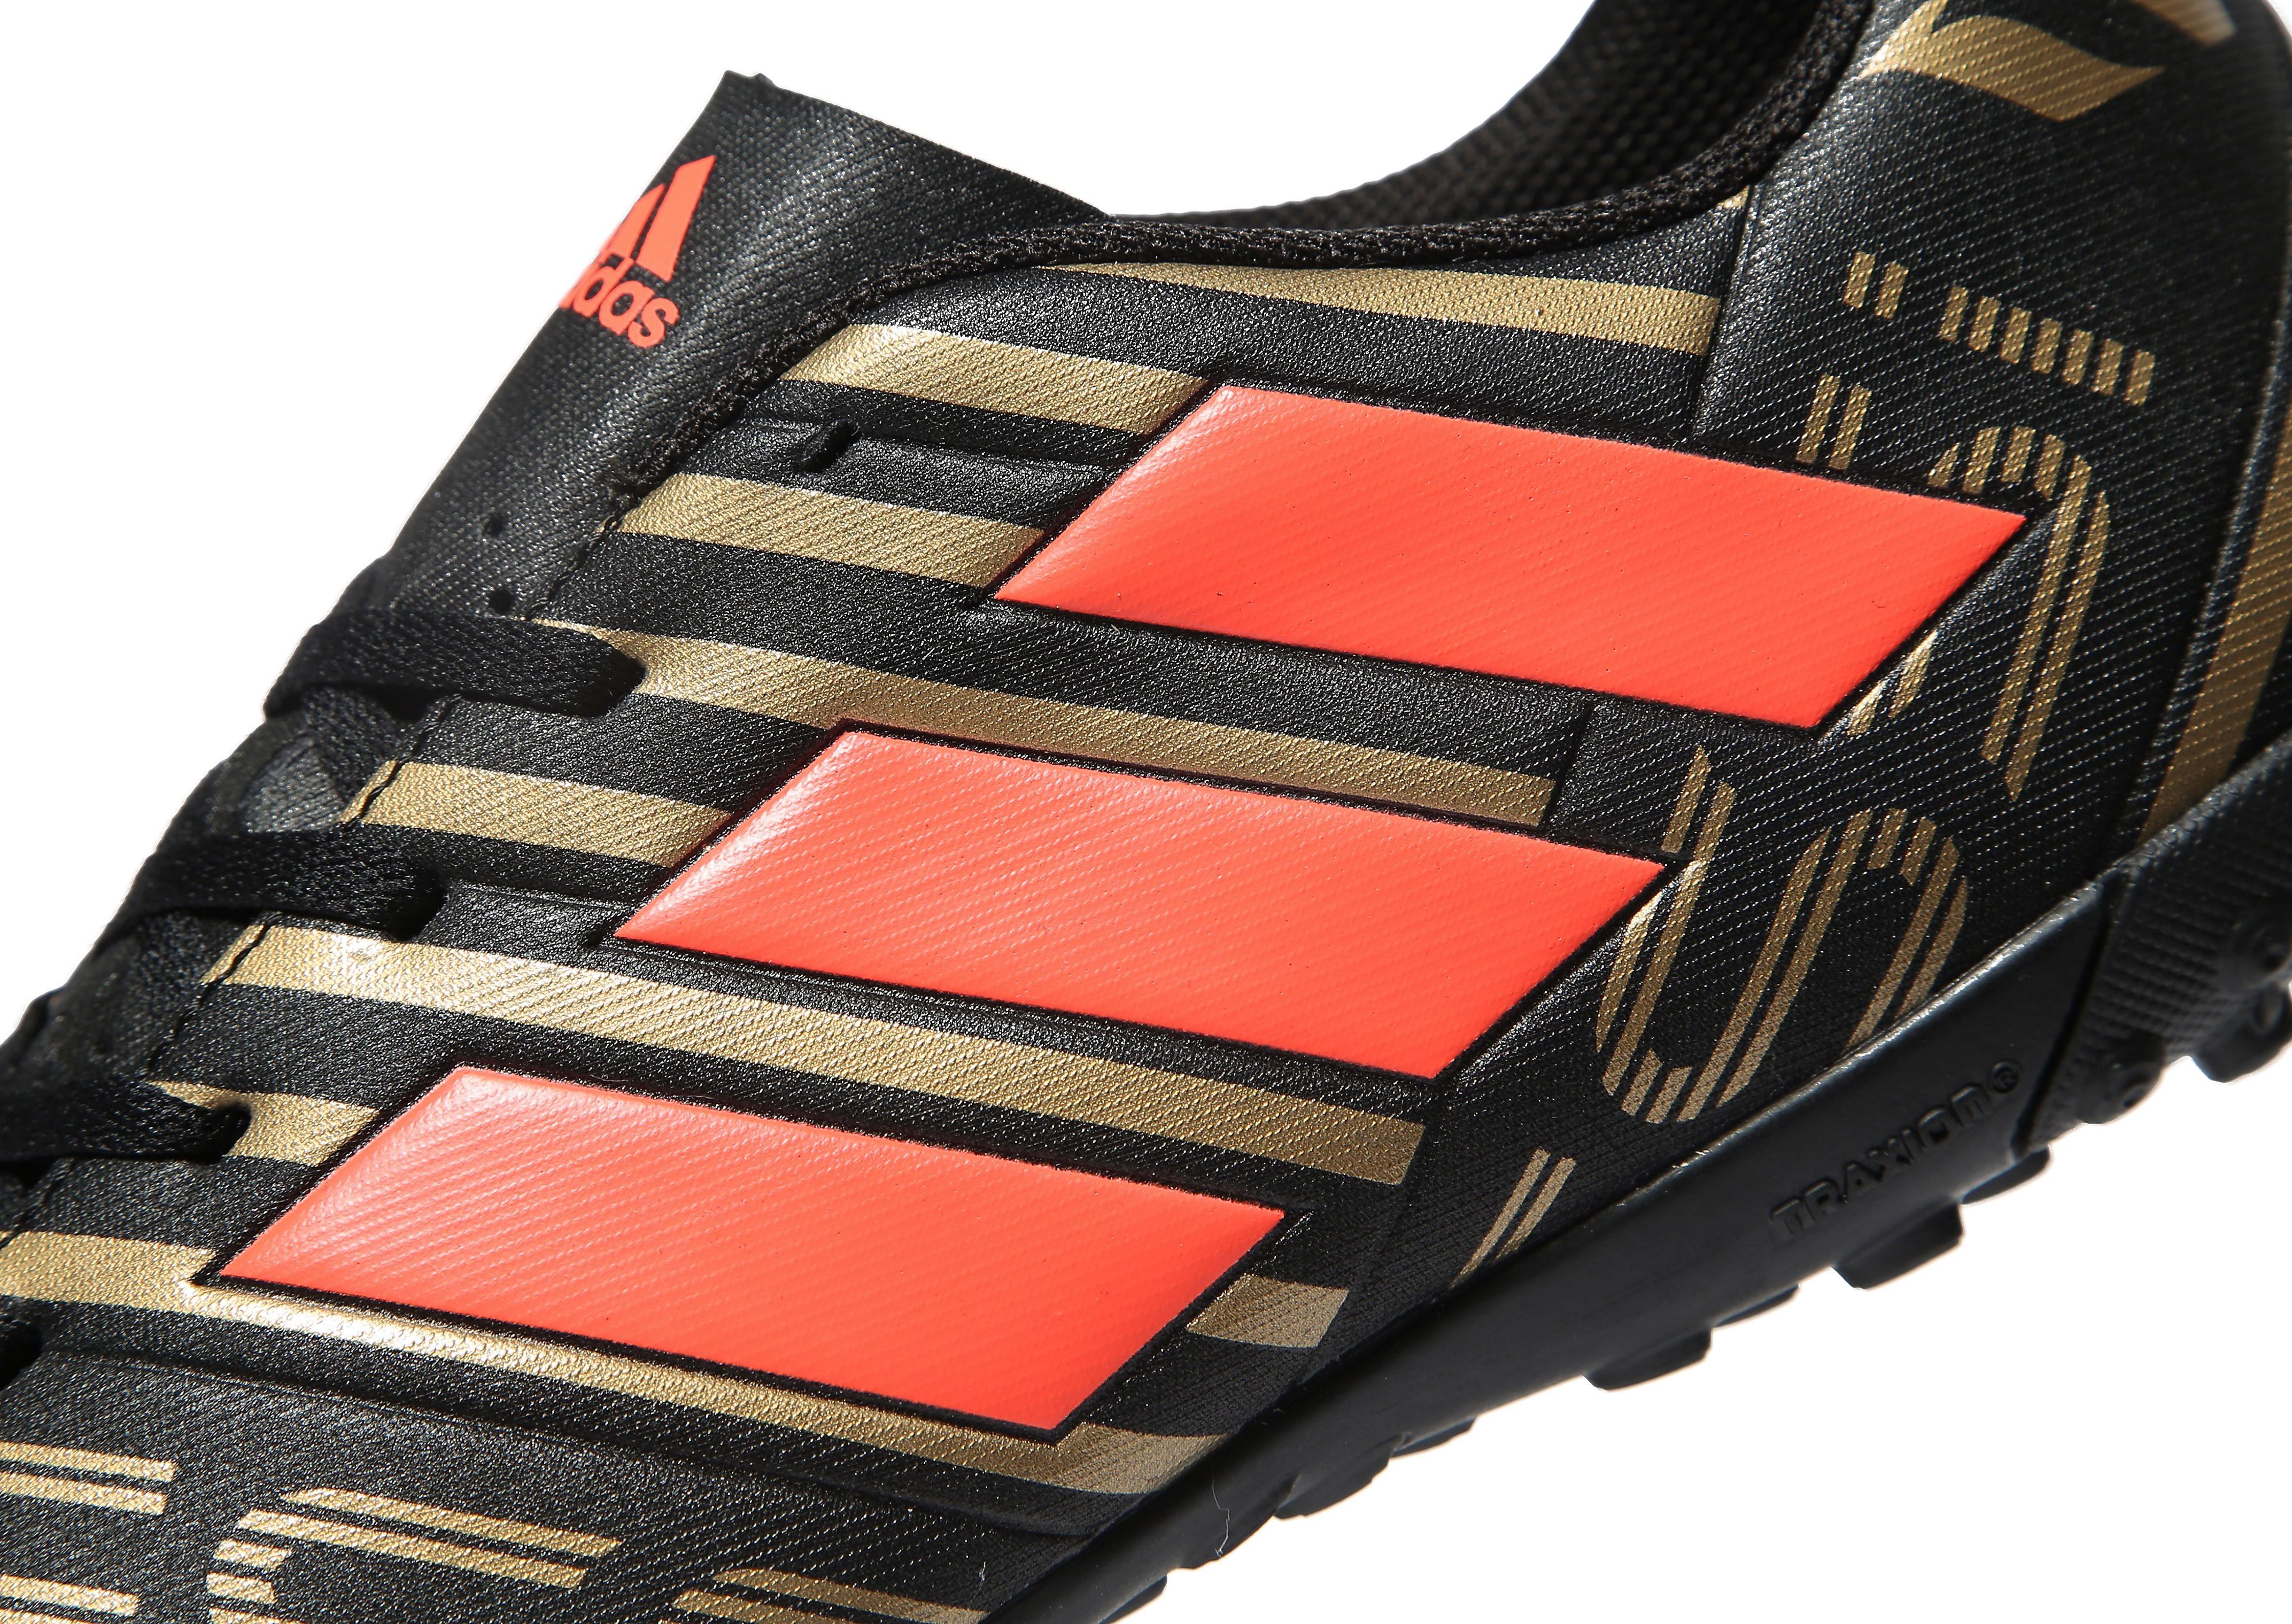 adidas SkyStalker Nemeziz Messi 17.4 TF